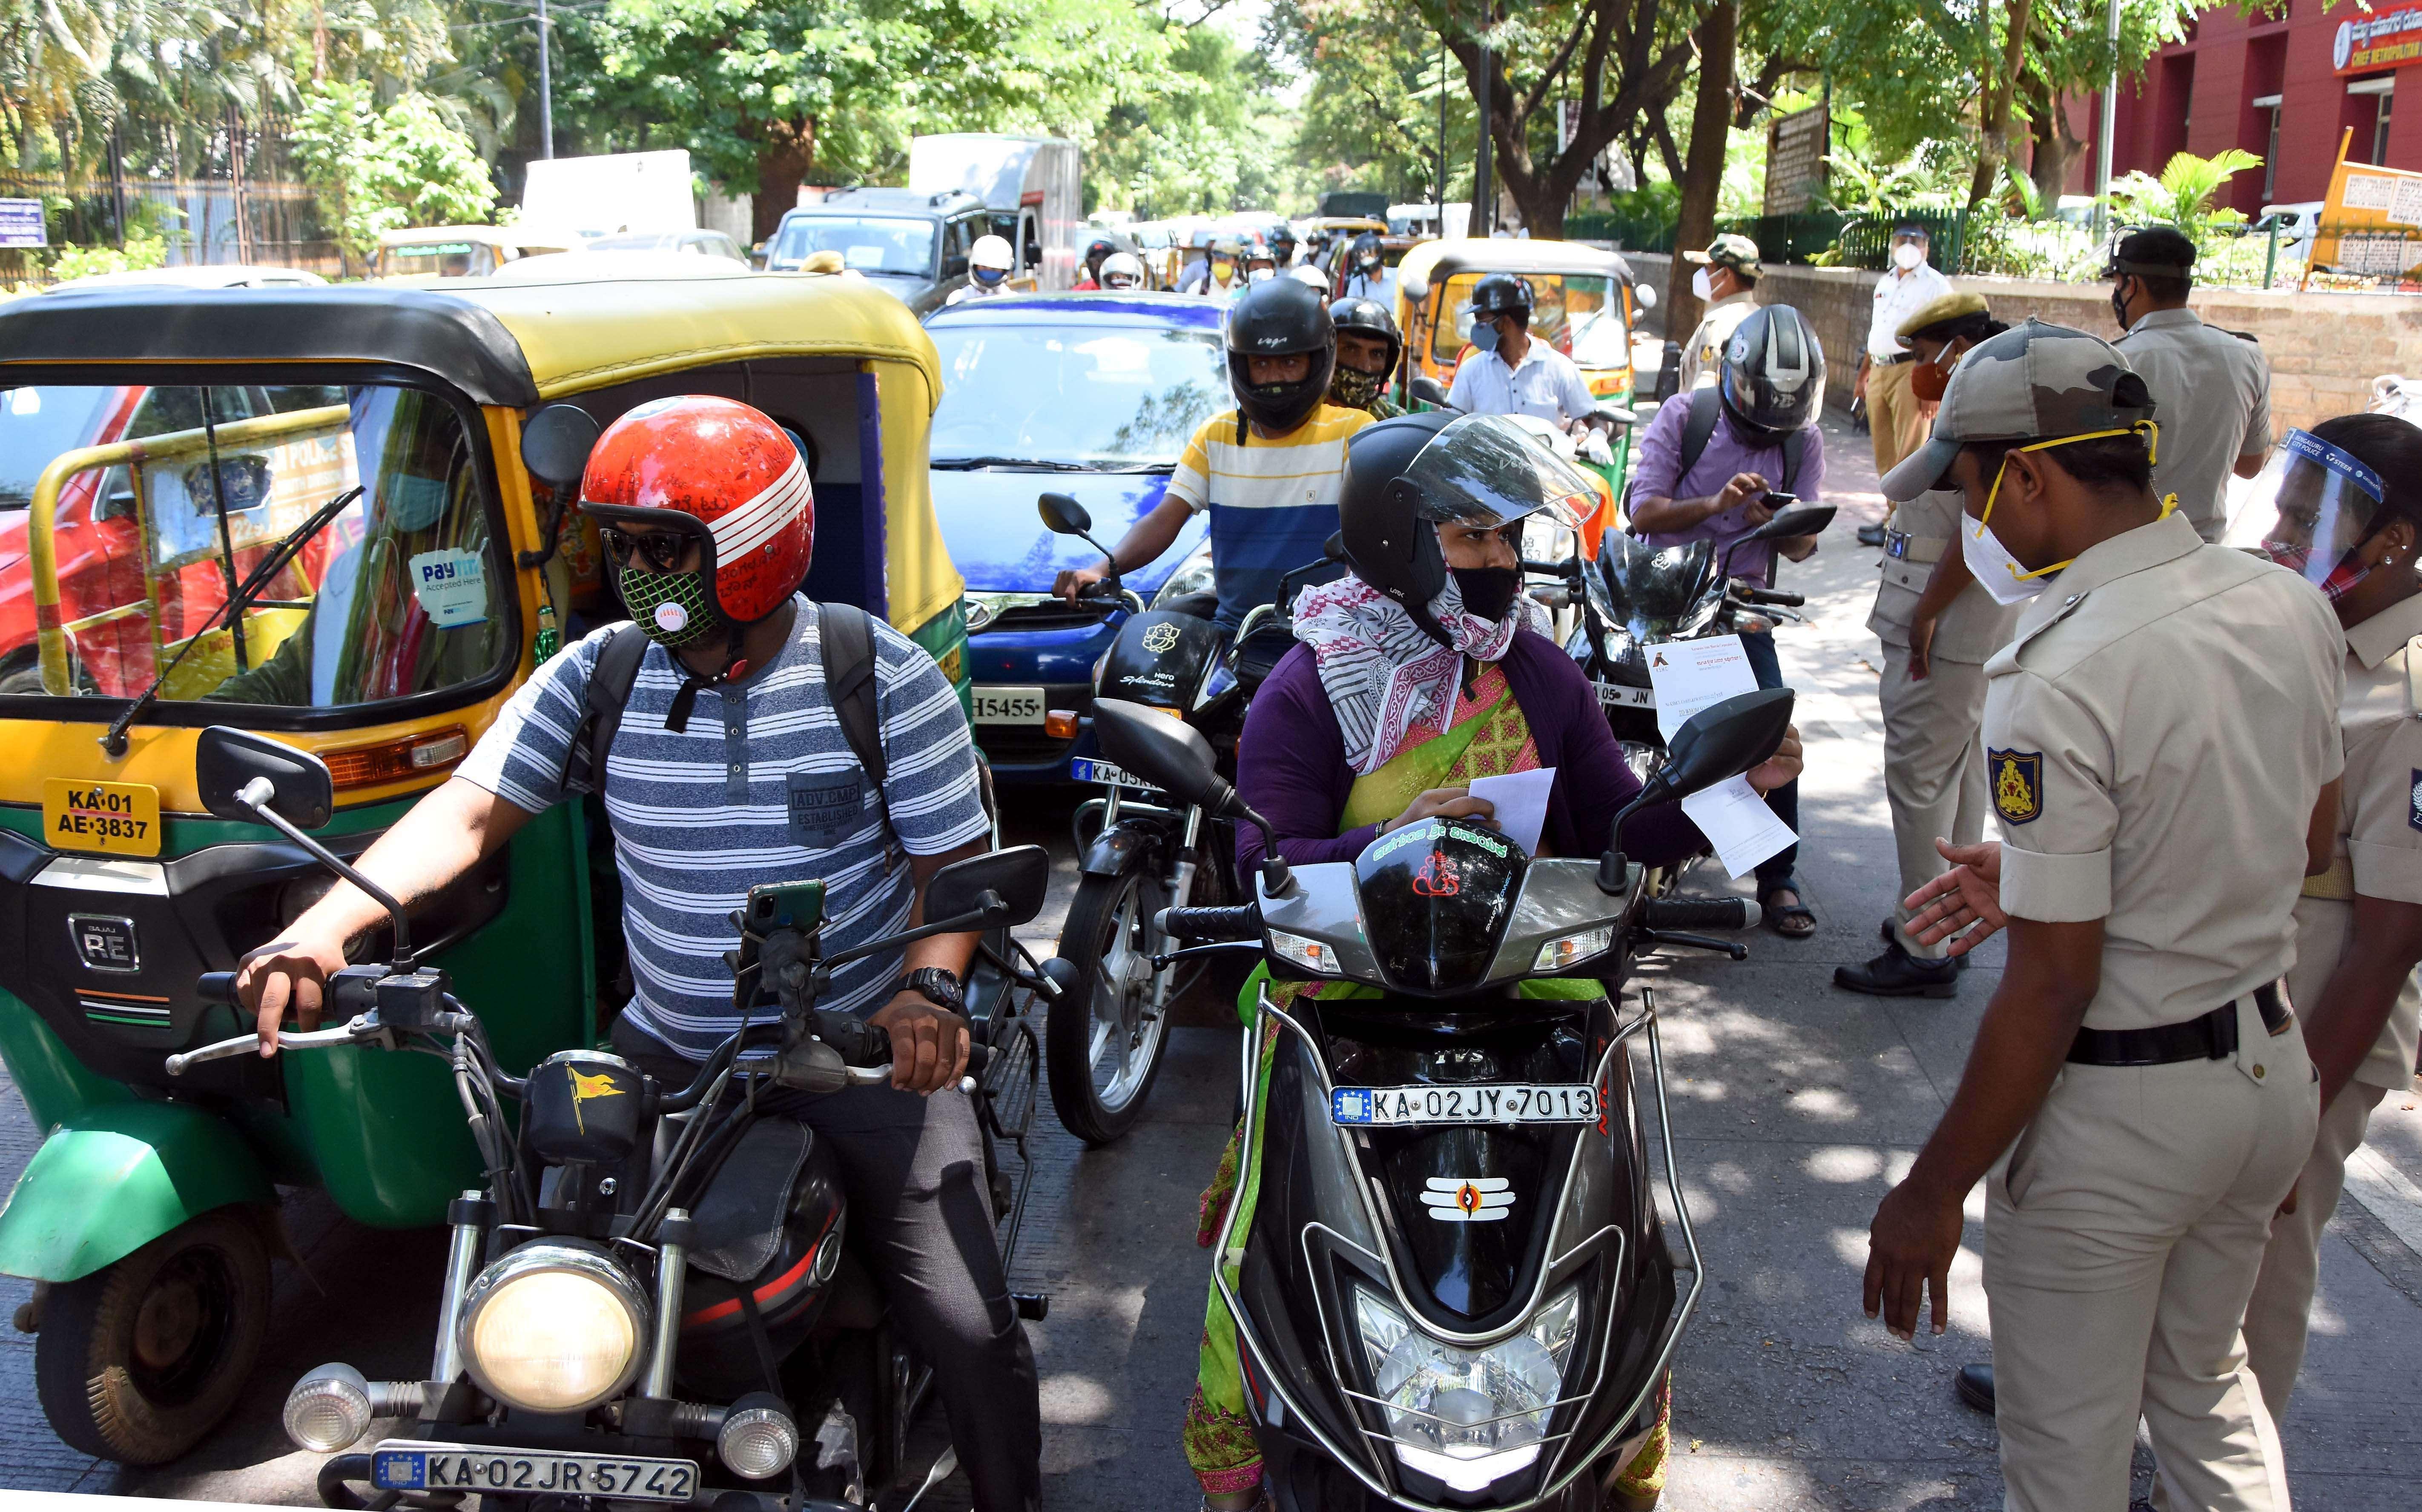 nrupatunga_road_01.jpg